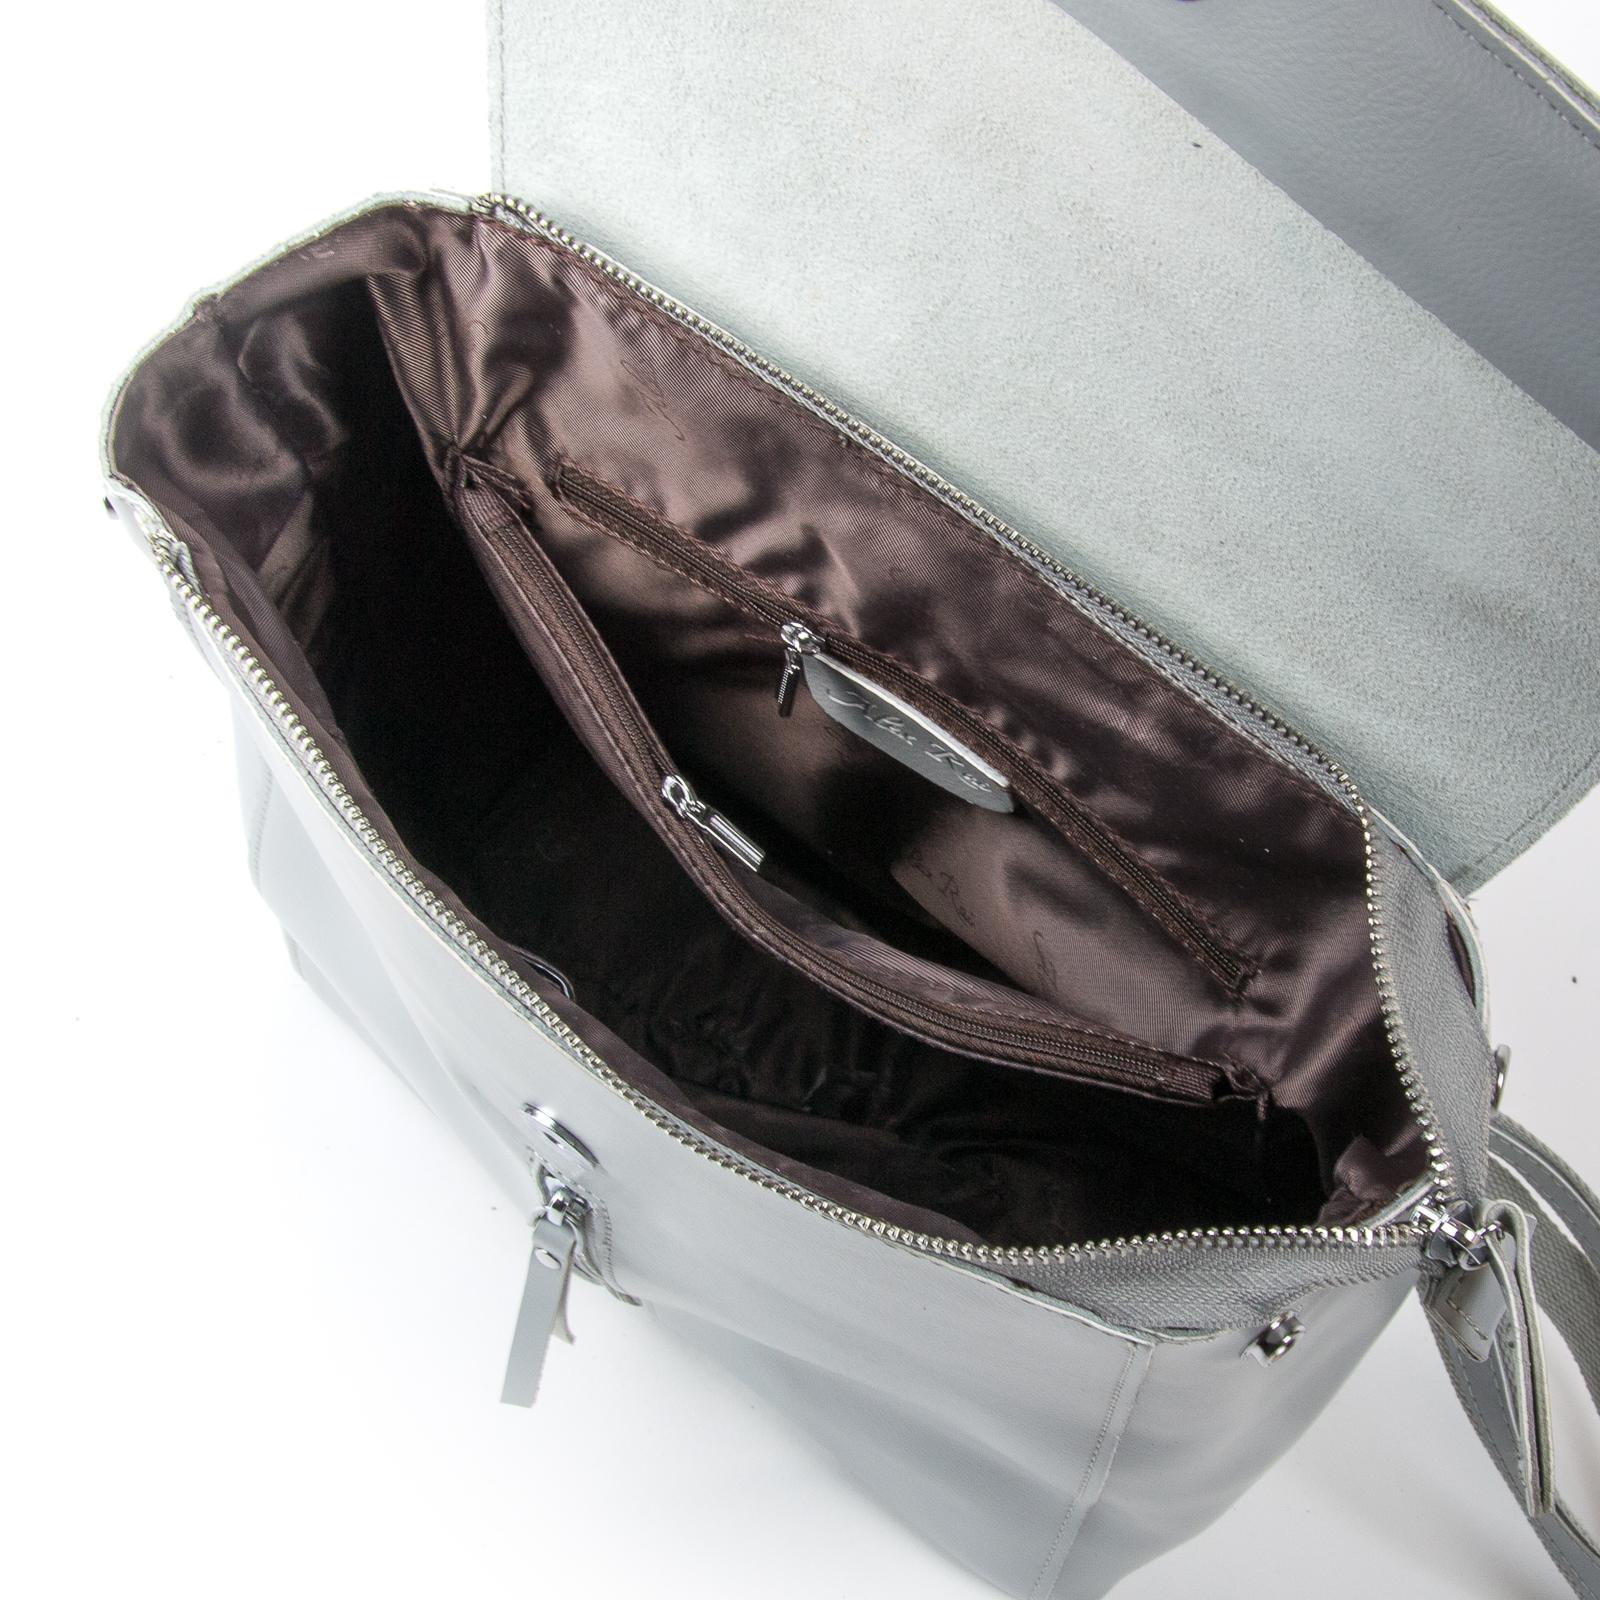 Сумка Женская Рюкзак кожа ALEX RAI 373 l-grey - фото 5